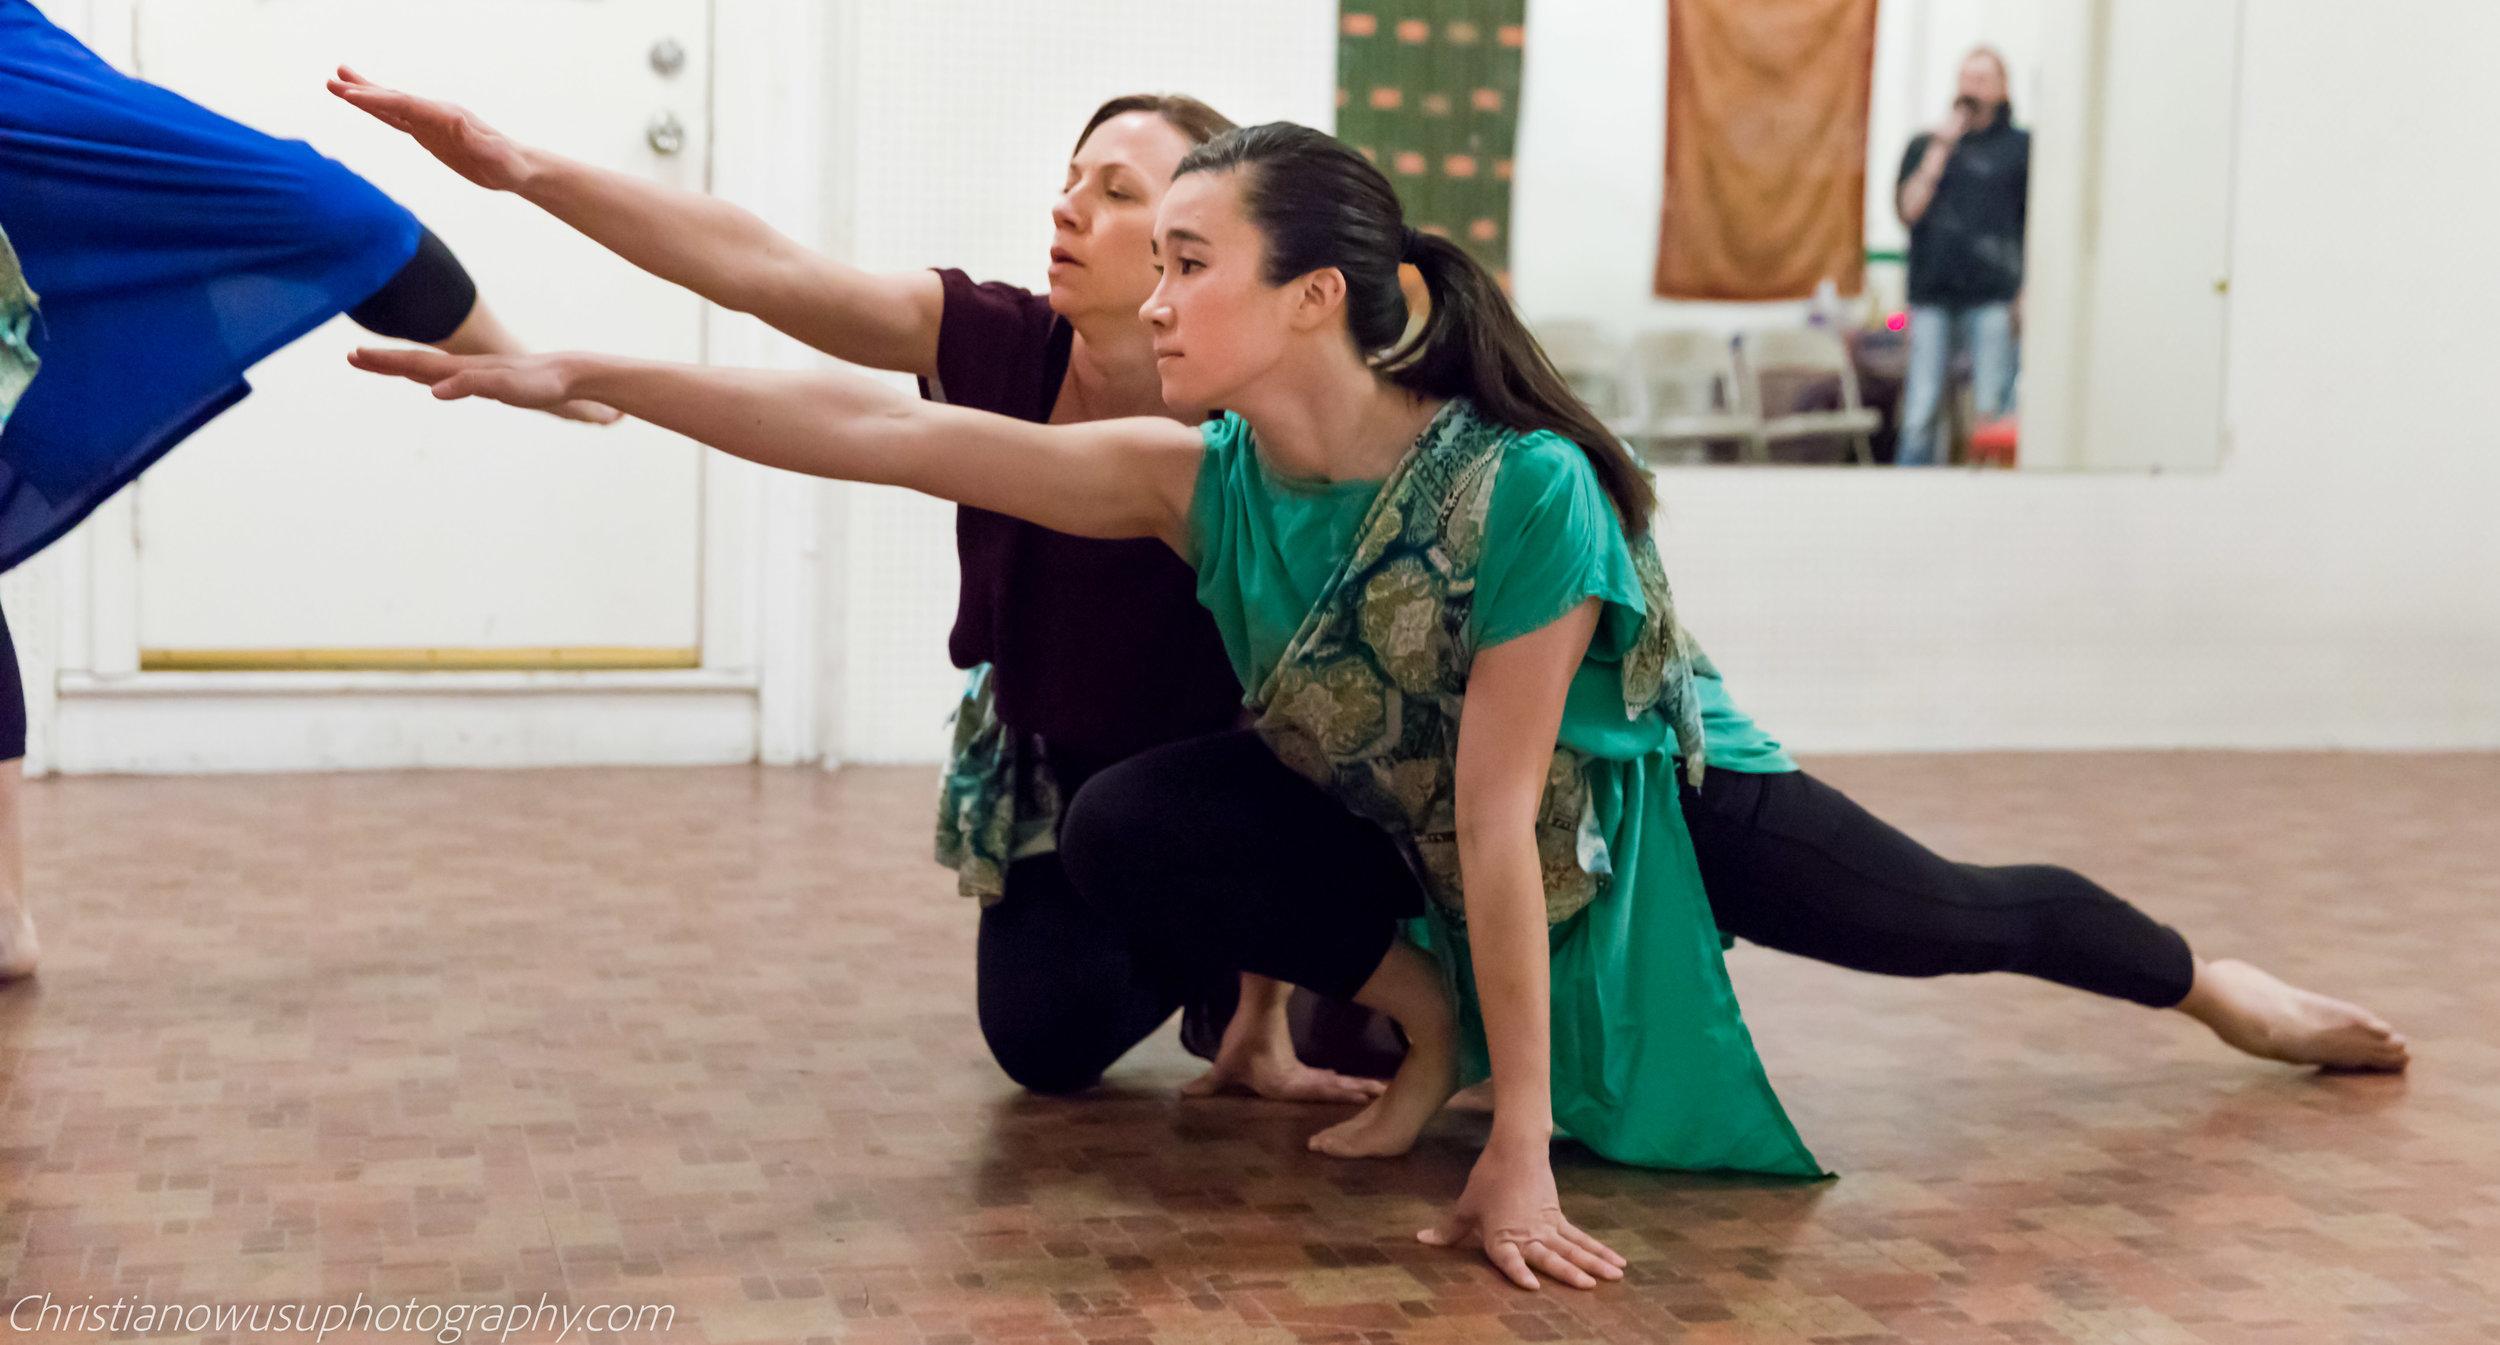 Kelley-Donovan-and-Dancers-photo-by Christian-Owusu.jpg